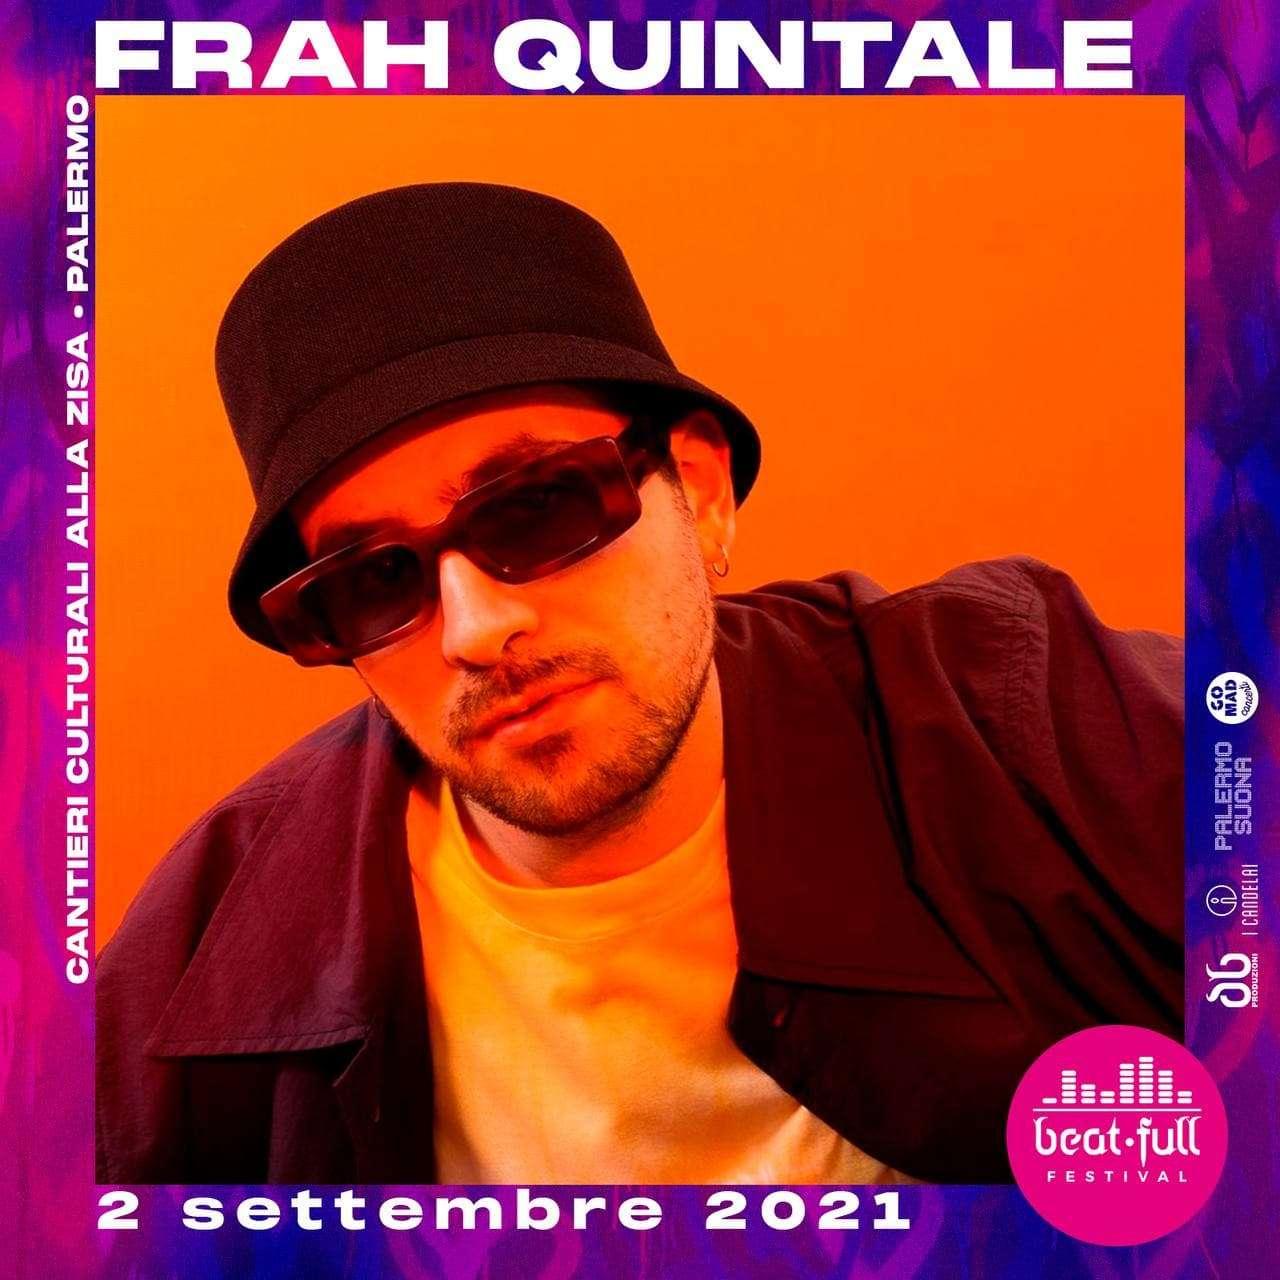 BEAT FULL FESTIVAL 2021 - FRAH QUINTALE + LA MUNICIPAL Cantieri Culturali alla Zisa Palermo